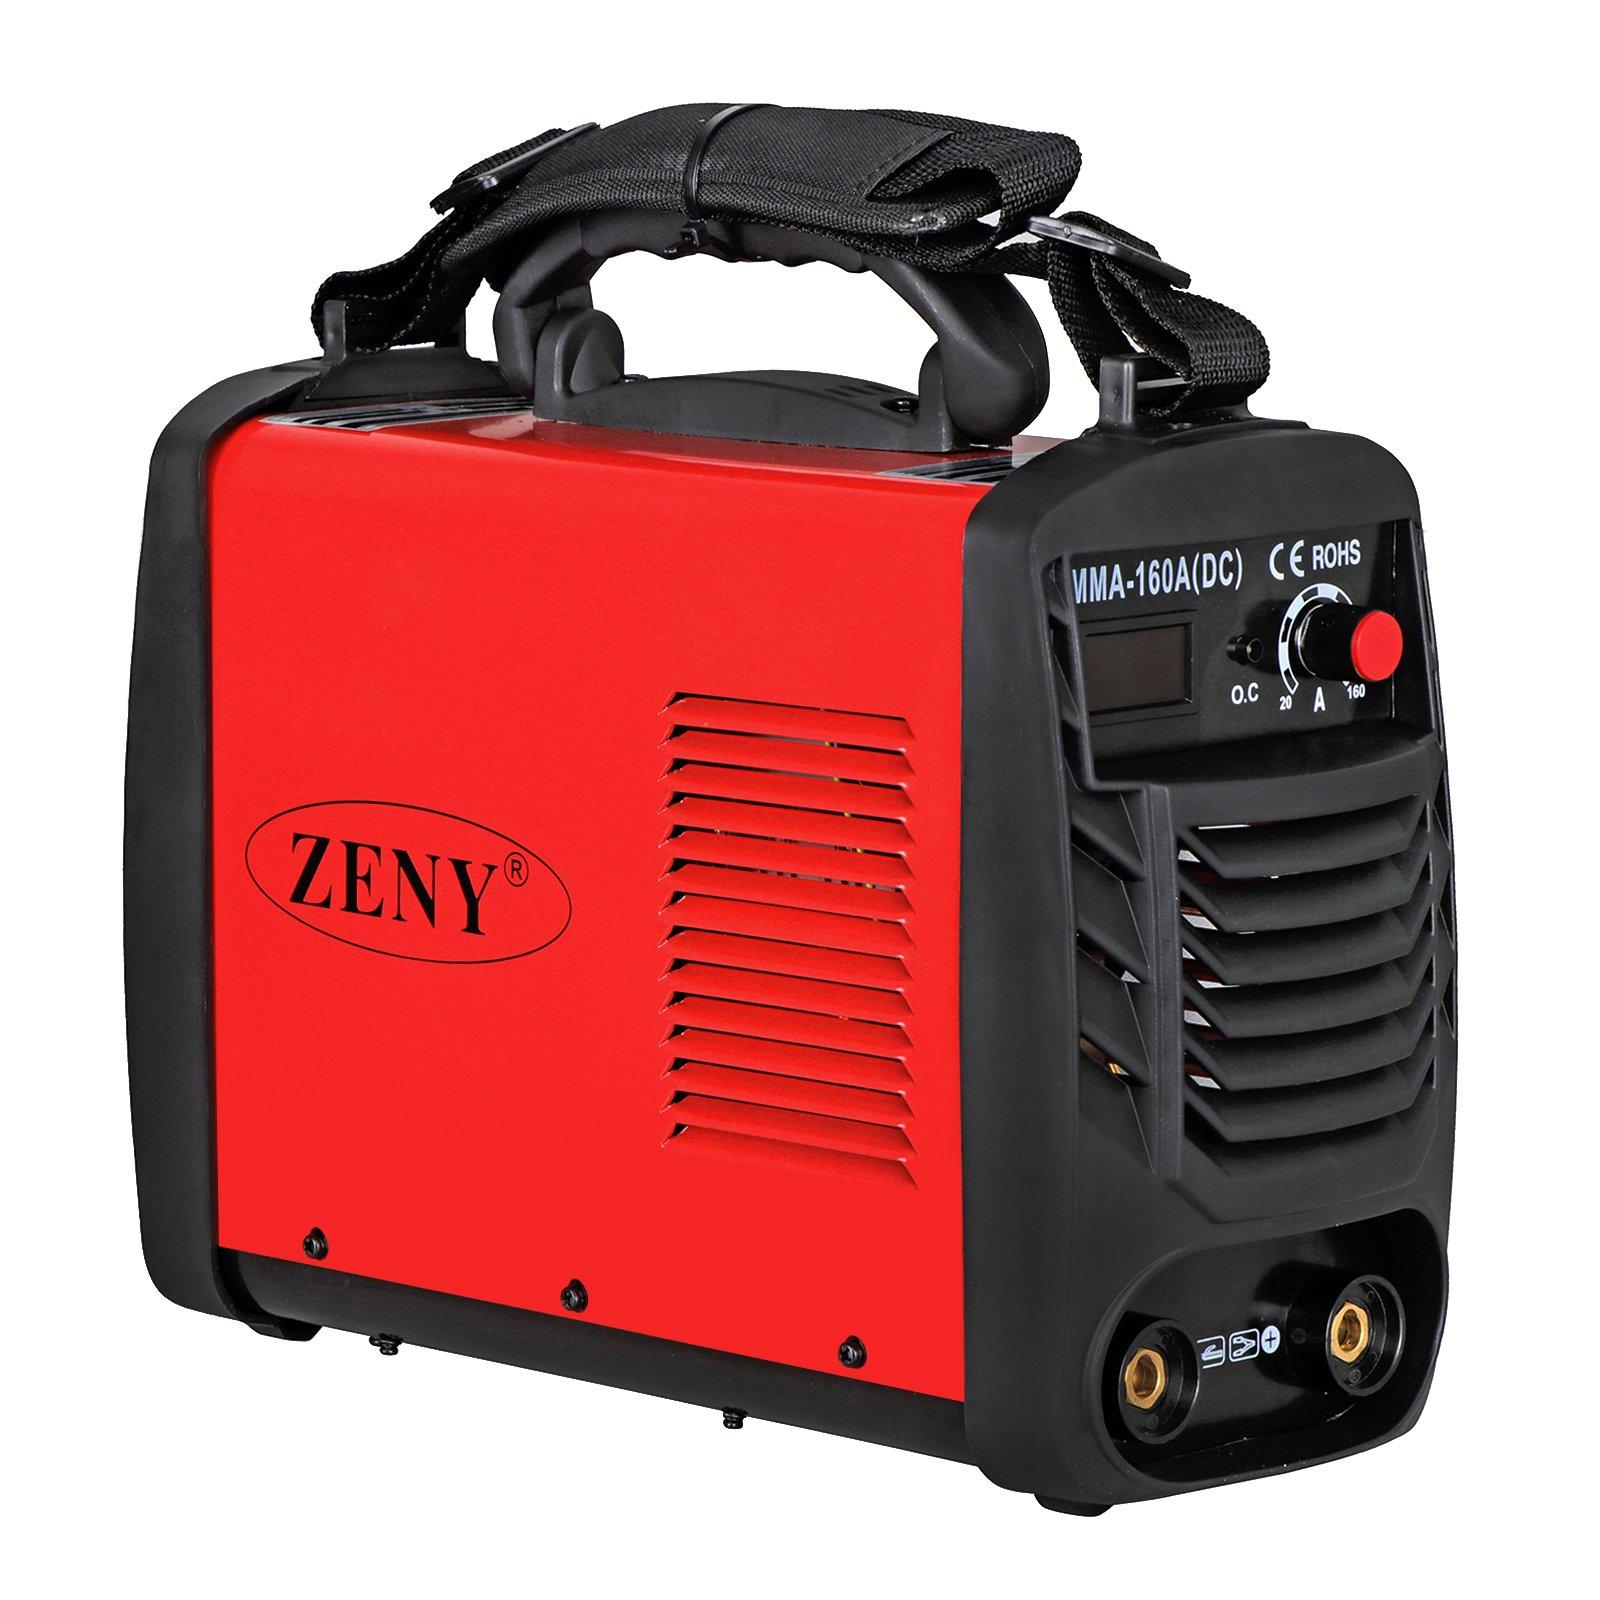 ZENY Arc Welding Machine DC Inverter Handheld Welder MMA 20-160A IGBT 110V/230V Dual Voltage IGBT Stick by ZENY (Image #8)